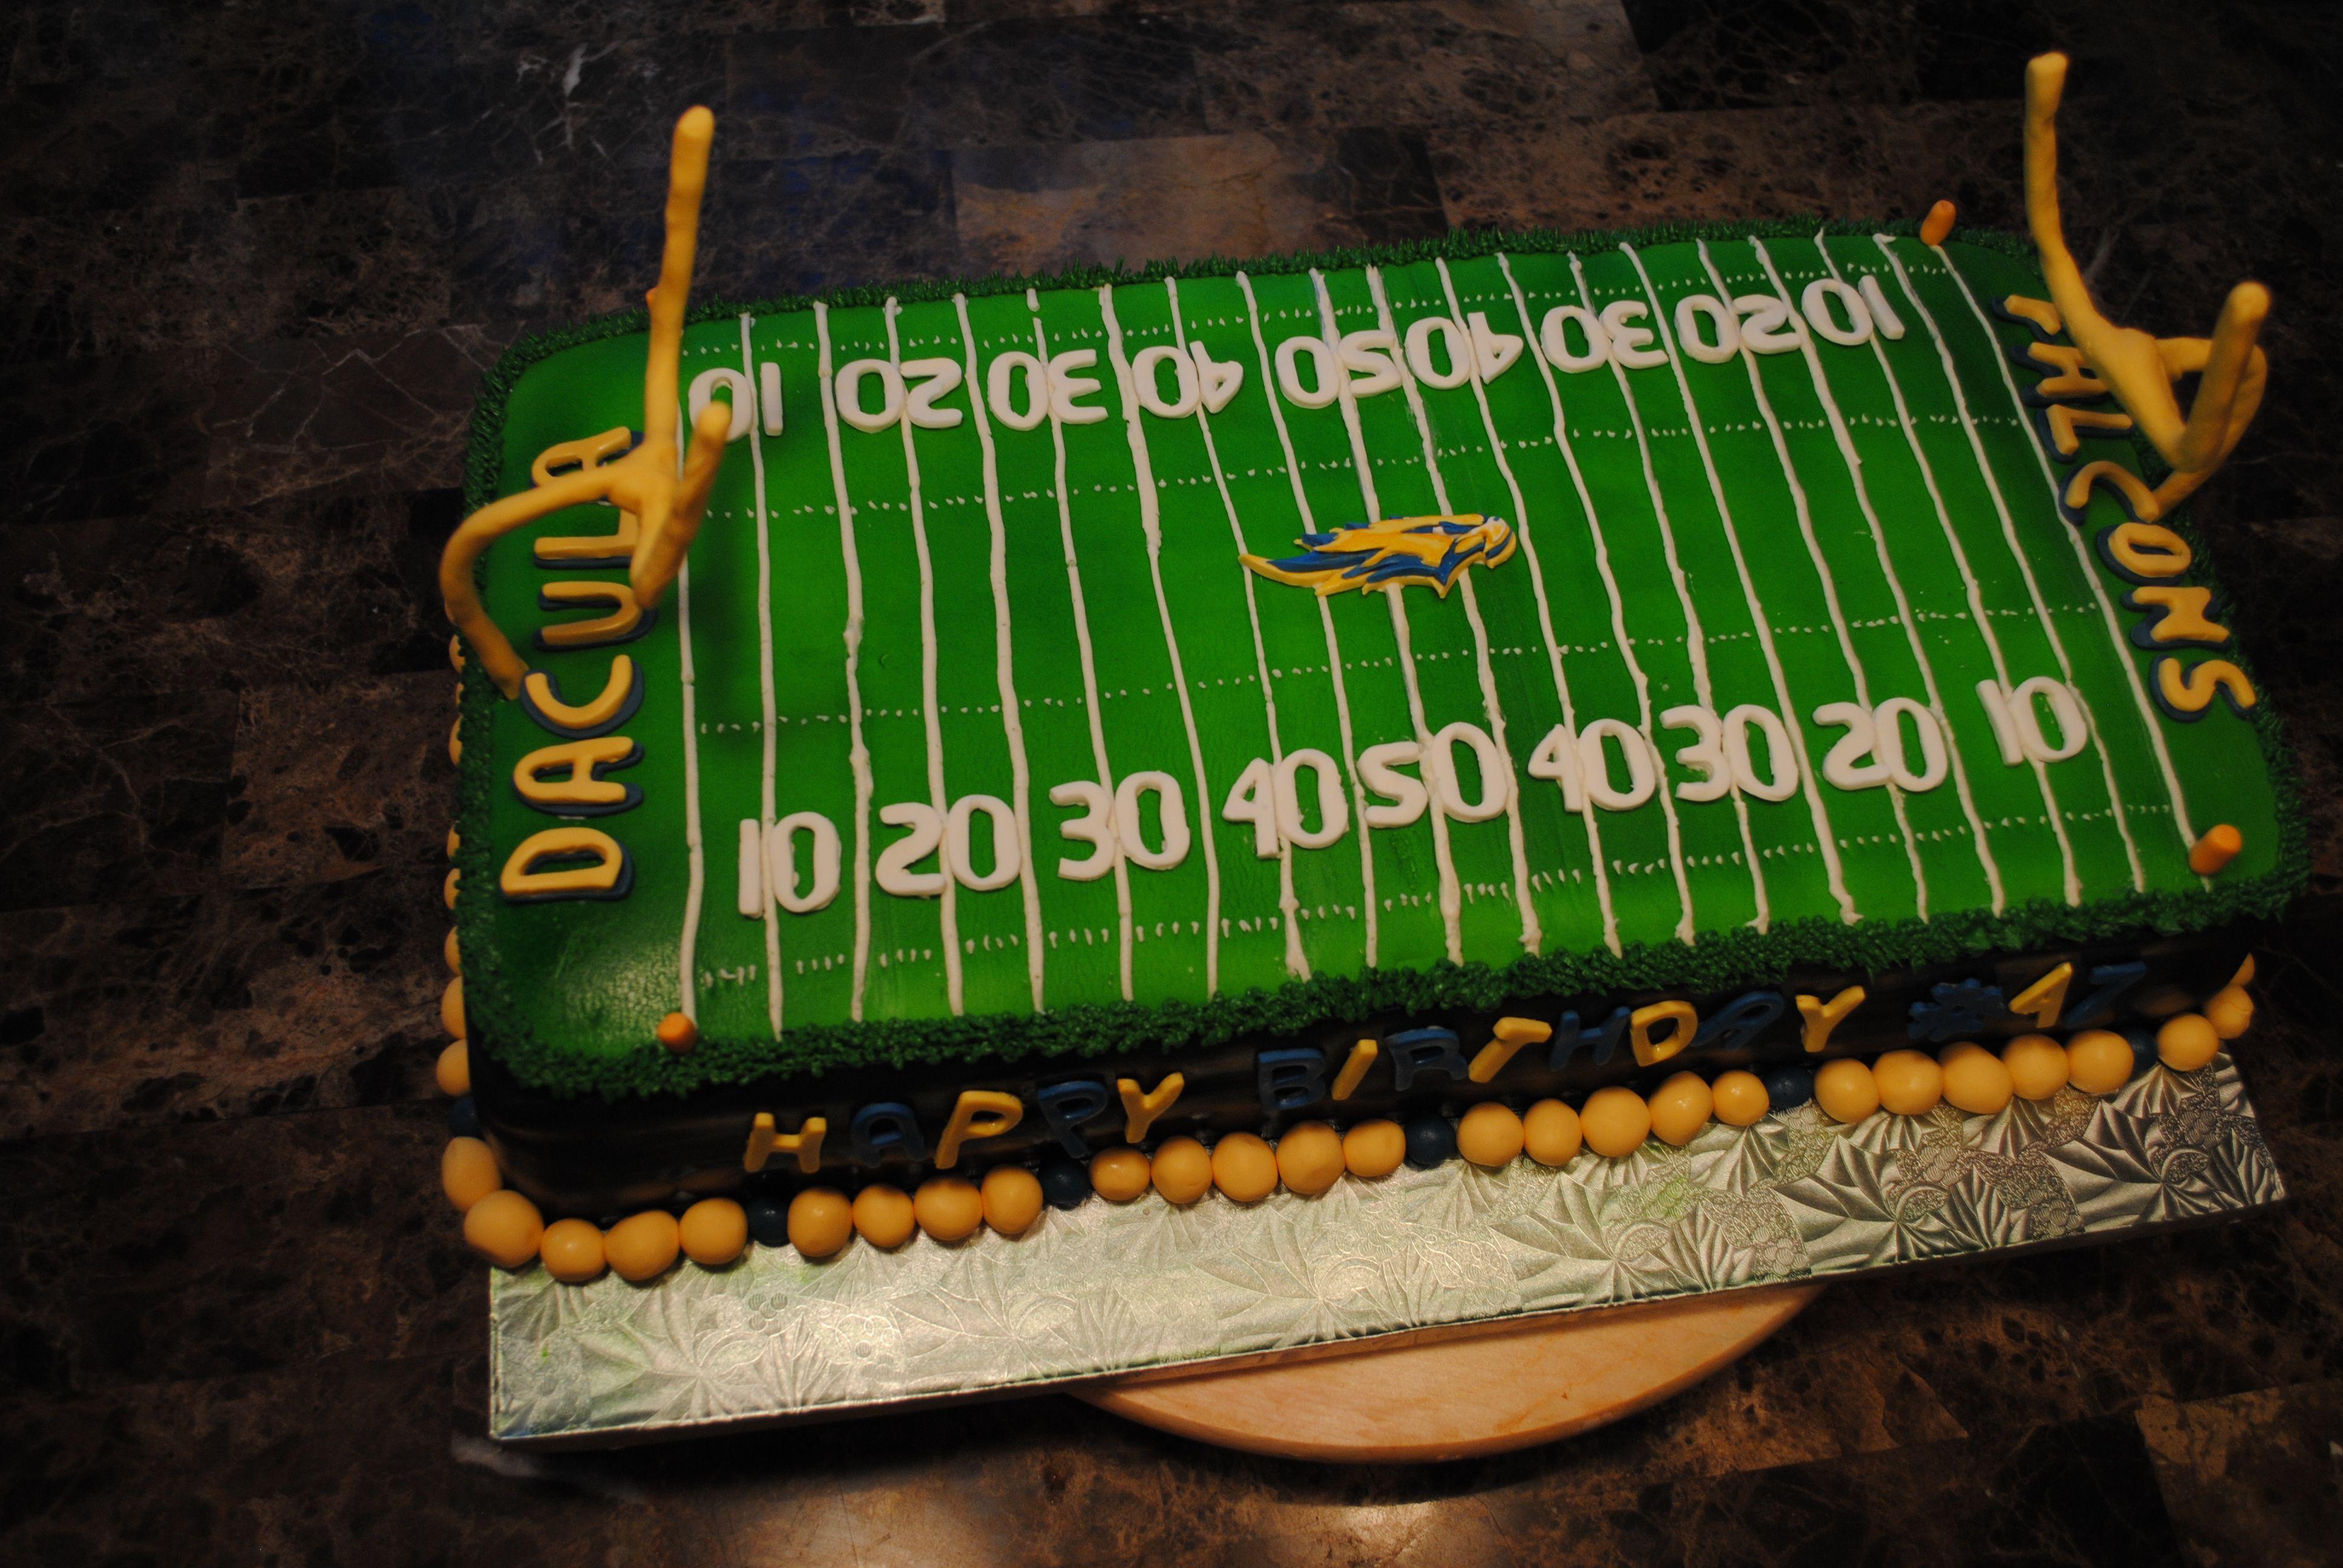 Football cake storing cake